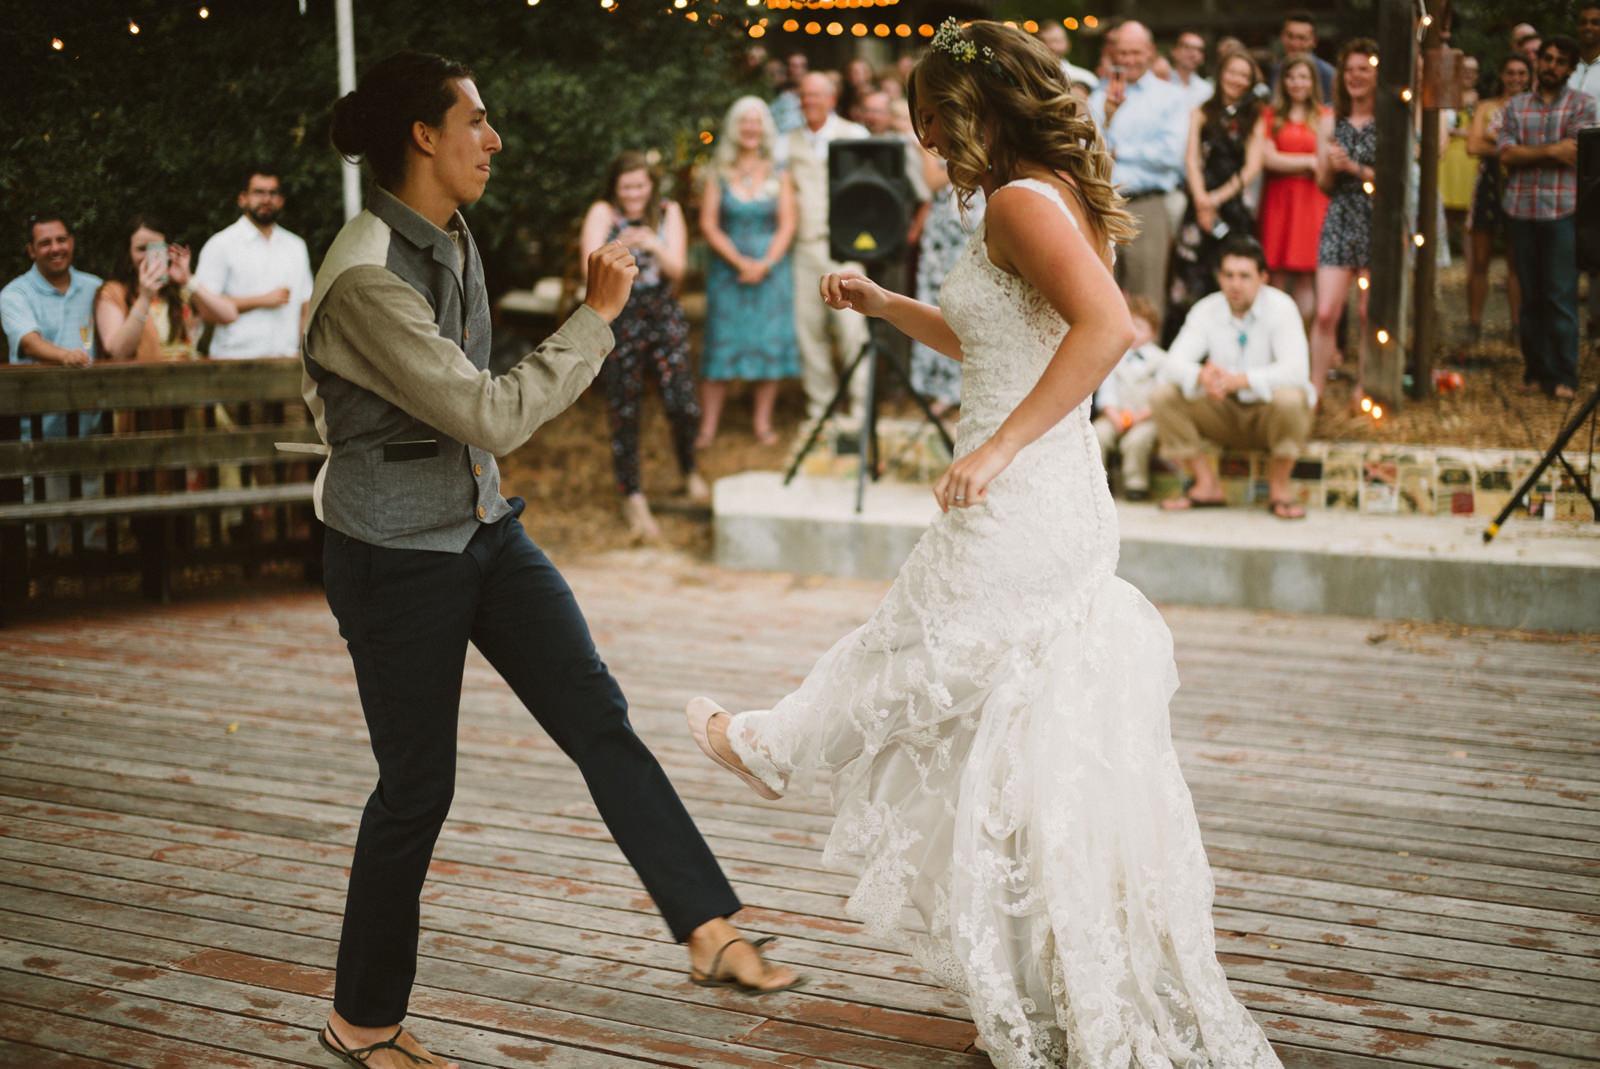 rivers-bend-retreat-wedding-097 RIVER'S BEND RETREAT WEDDING